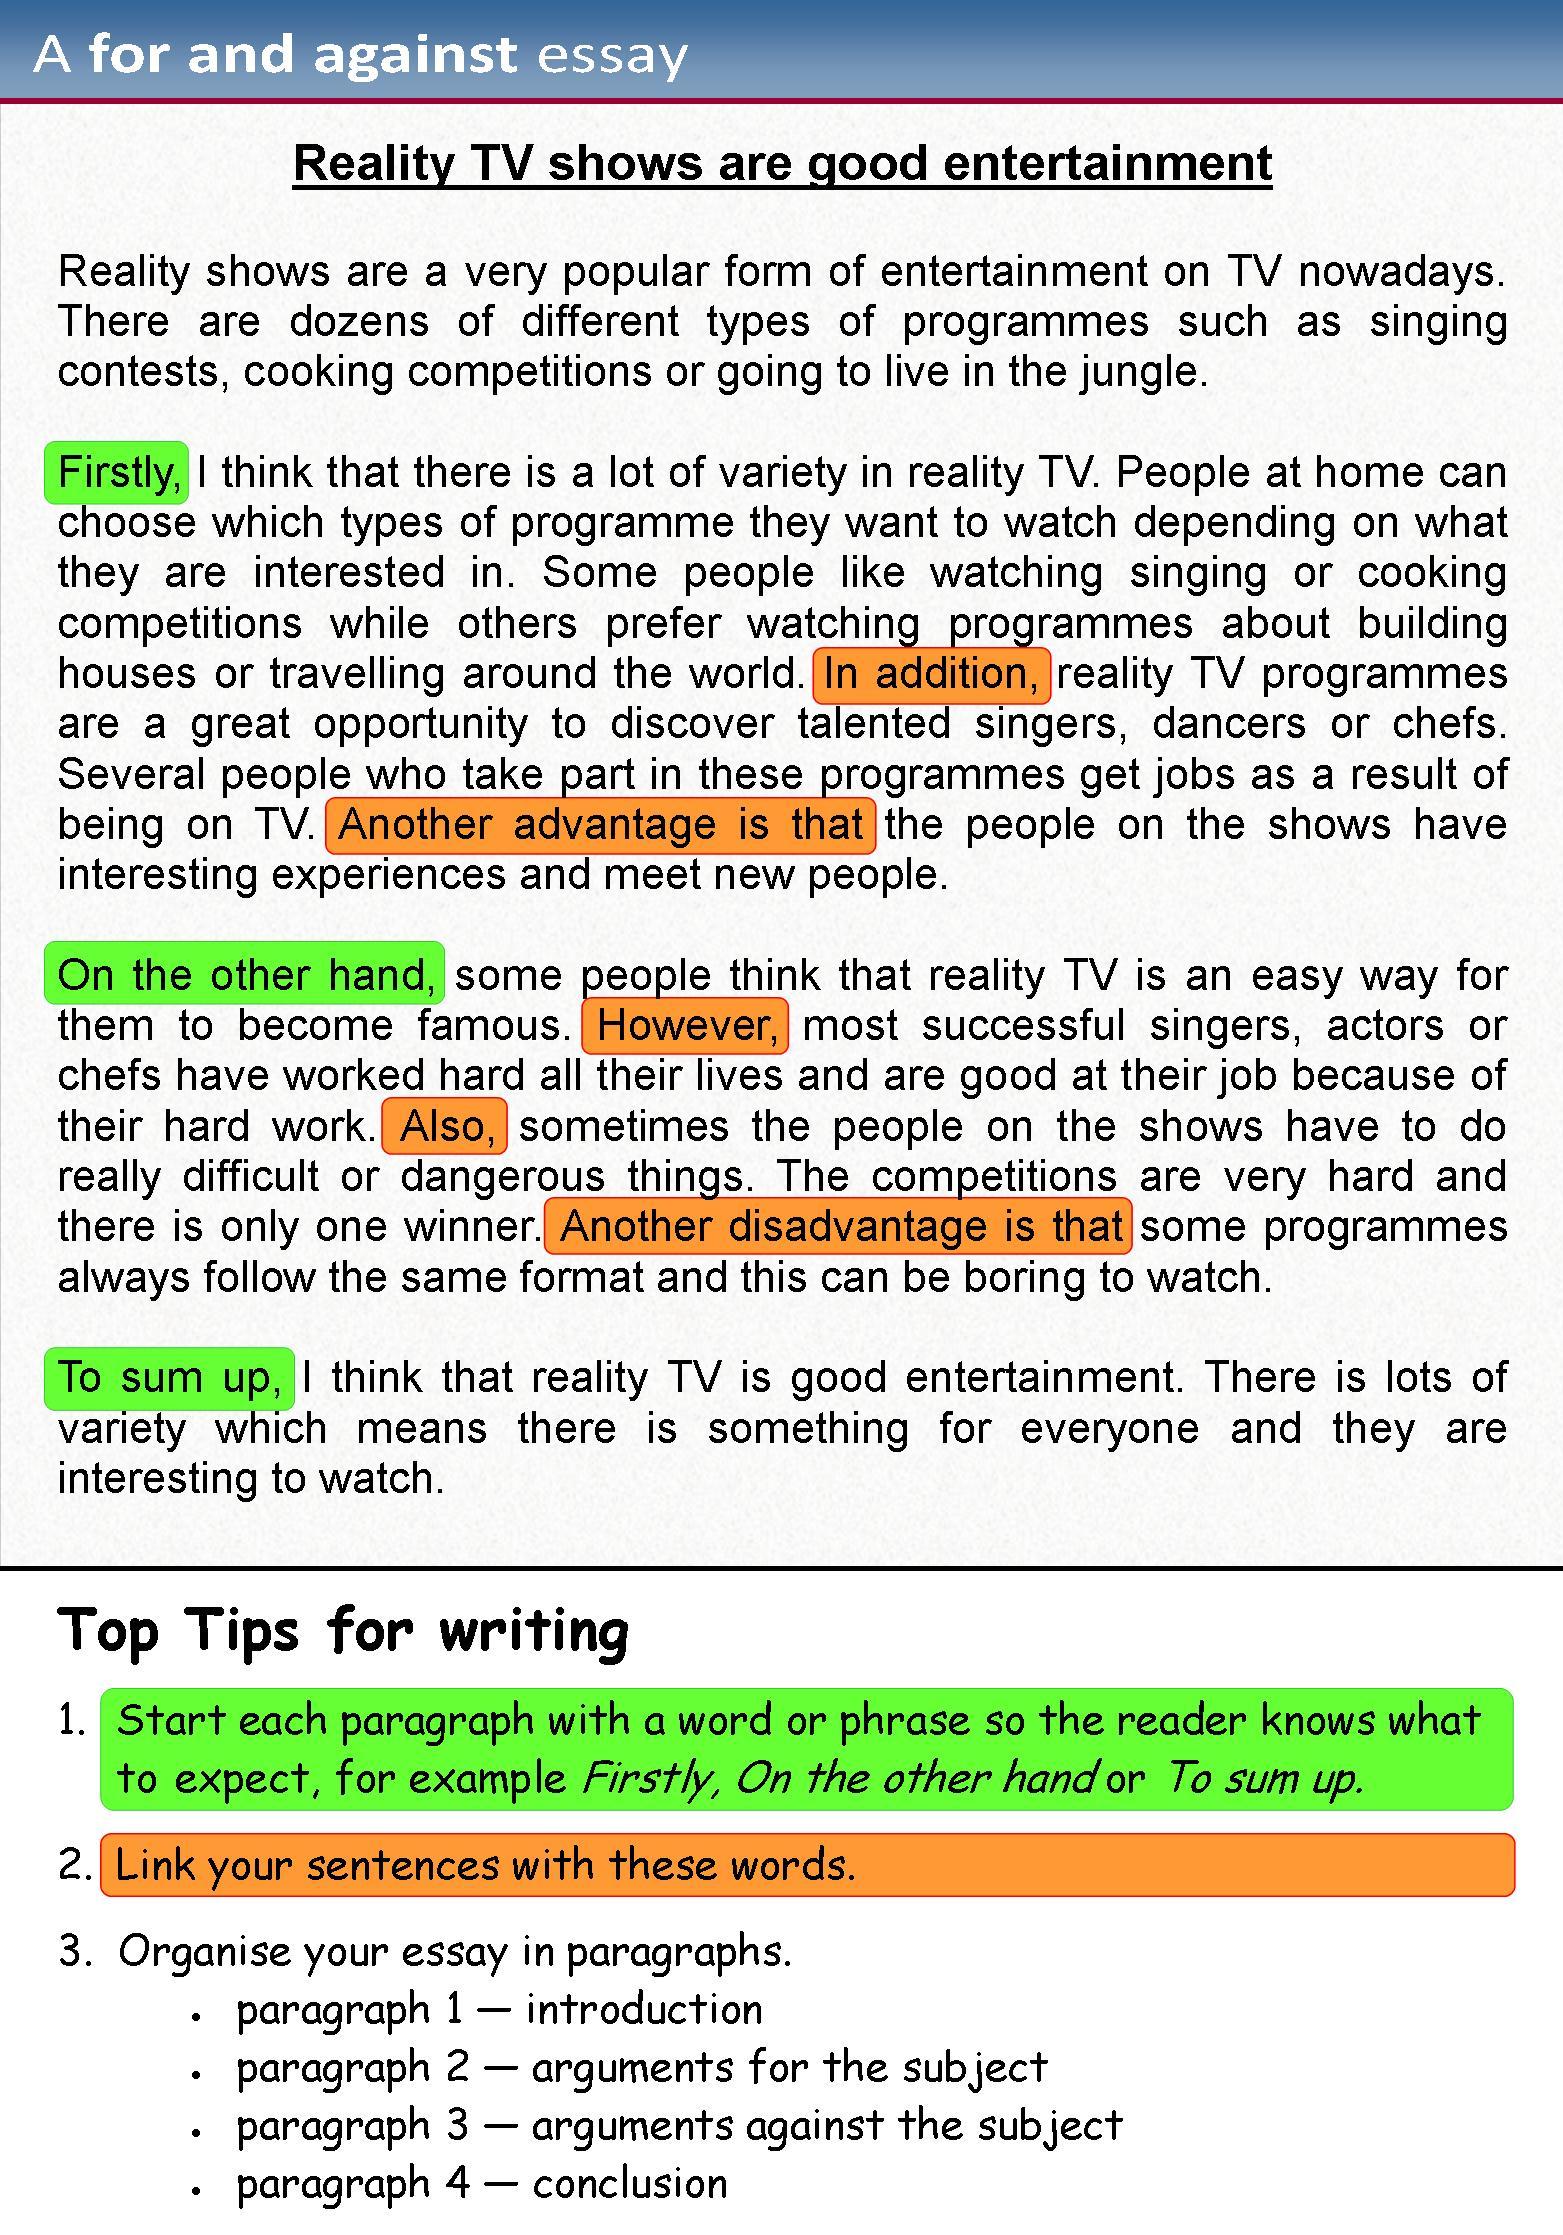 016 For Against Essay 1 Funny Essays Stupendous Examples Short Full